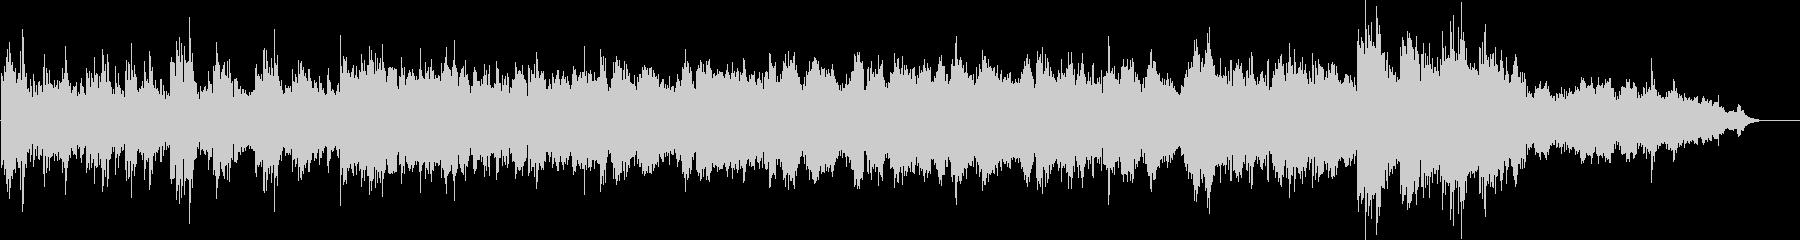 Elegant and gentle easy listening's unreproduced waveform